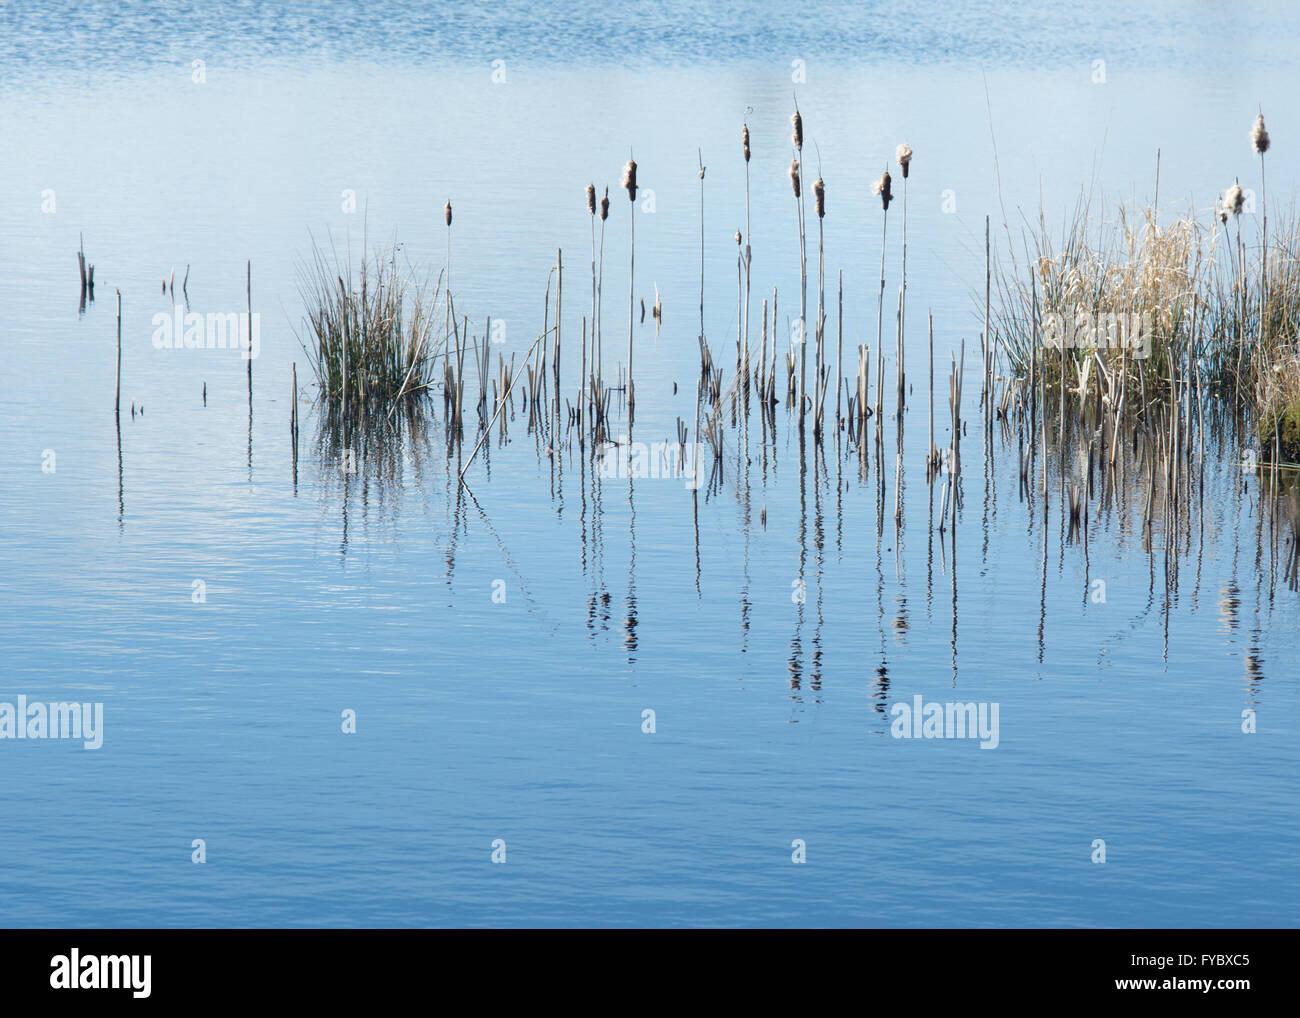 Bullrushes Reflections at Cors Caron Nature Reserve Stock Photo